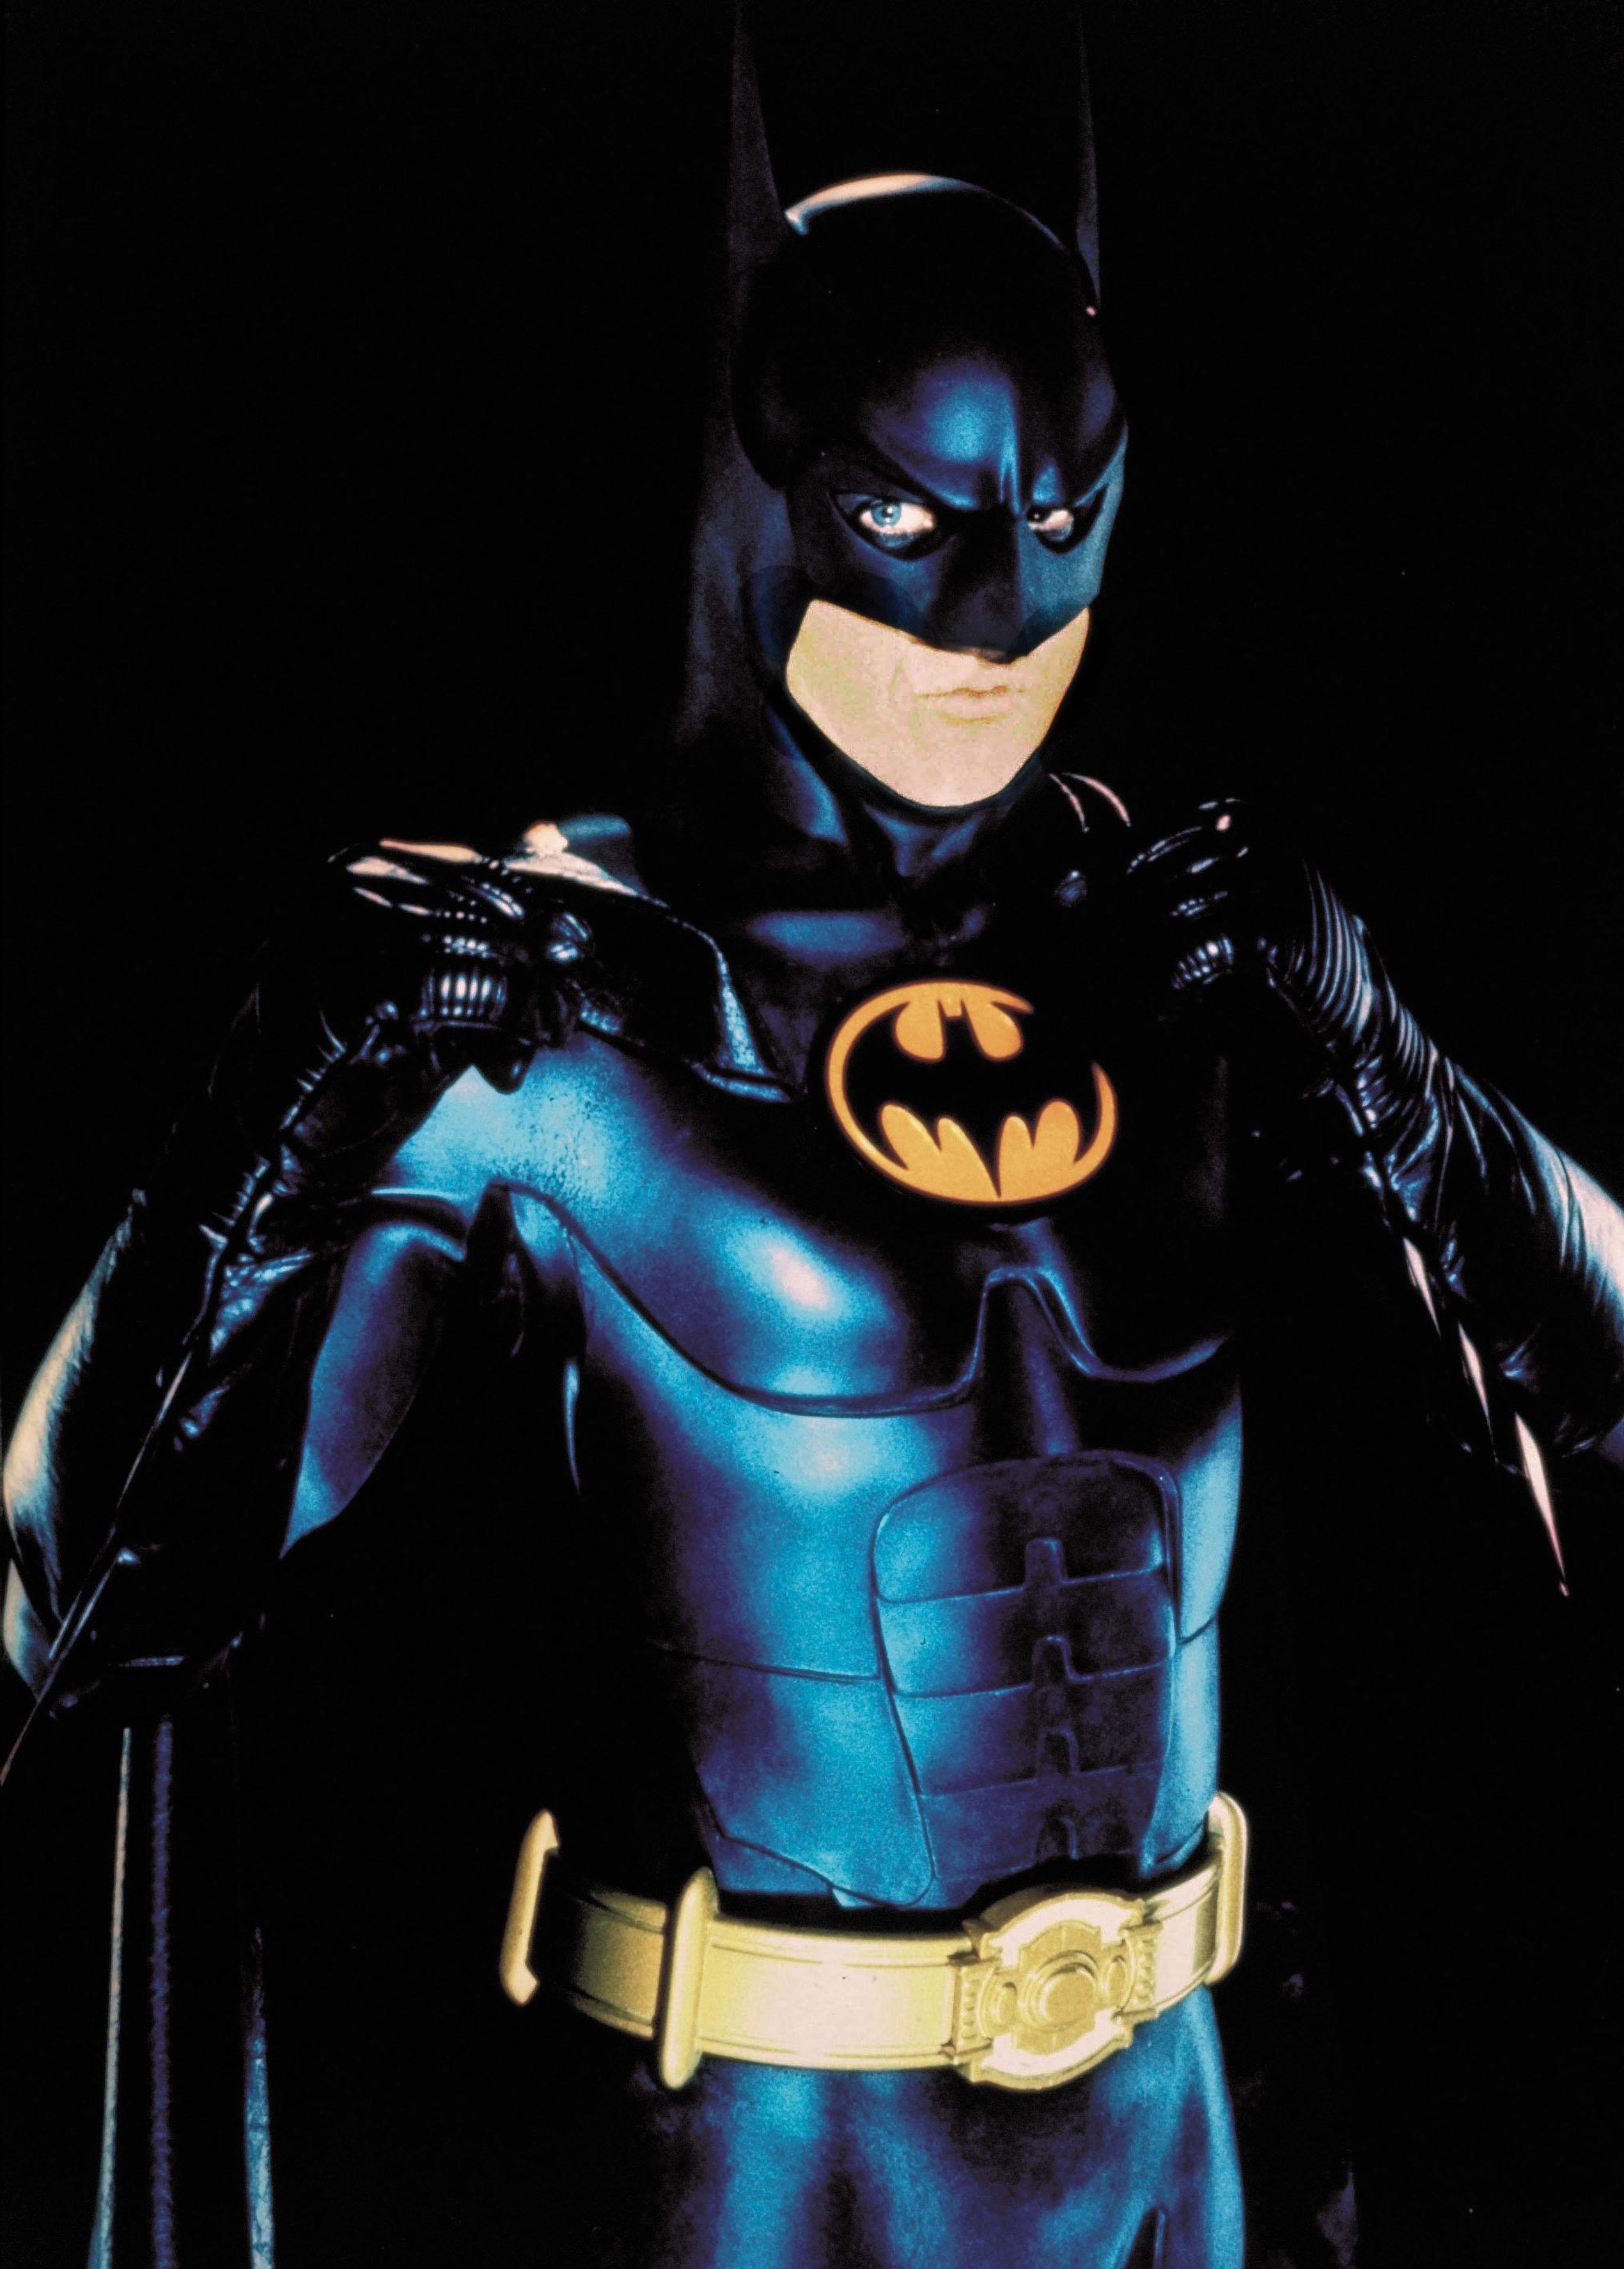 Michael Keaton in Batman Returns in 1992.